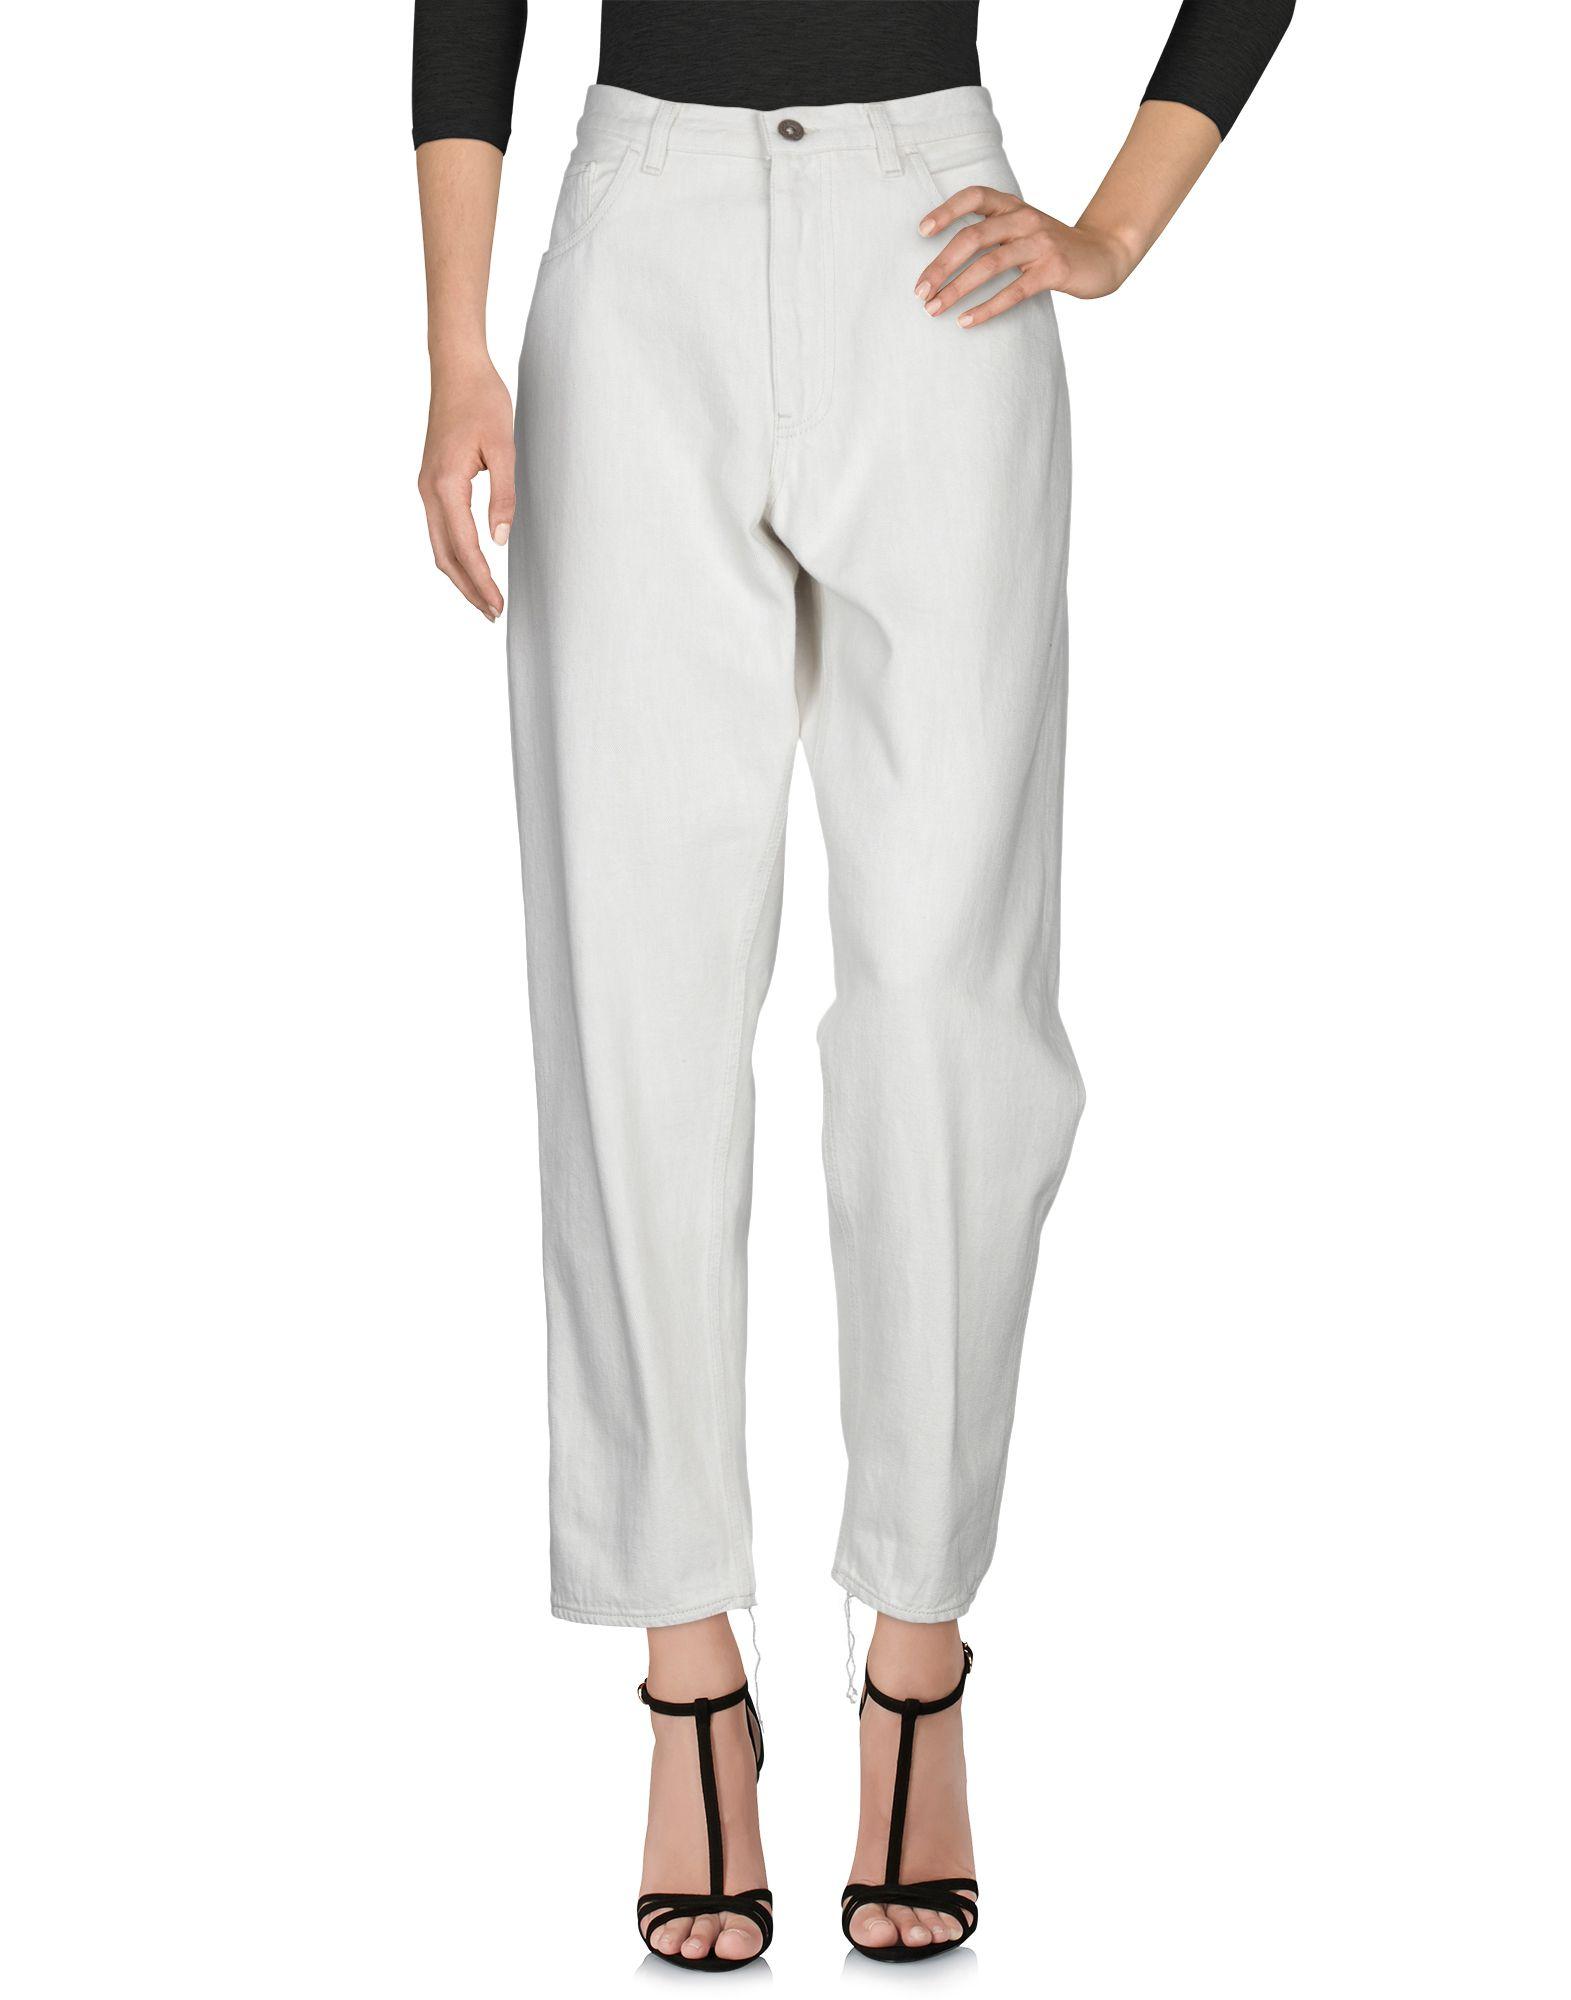 Pantaloni Jeans Pence Donna - Acquista online su JNc5CWL